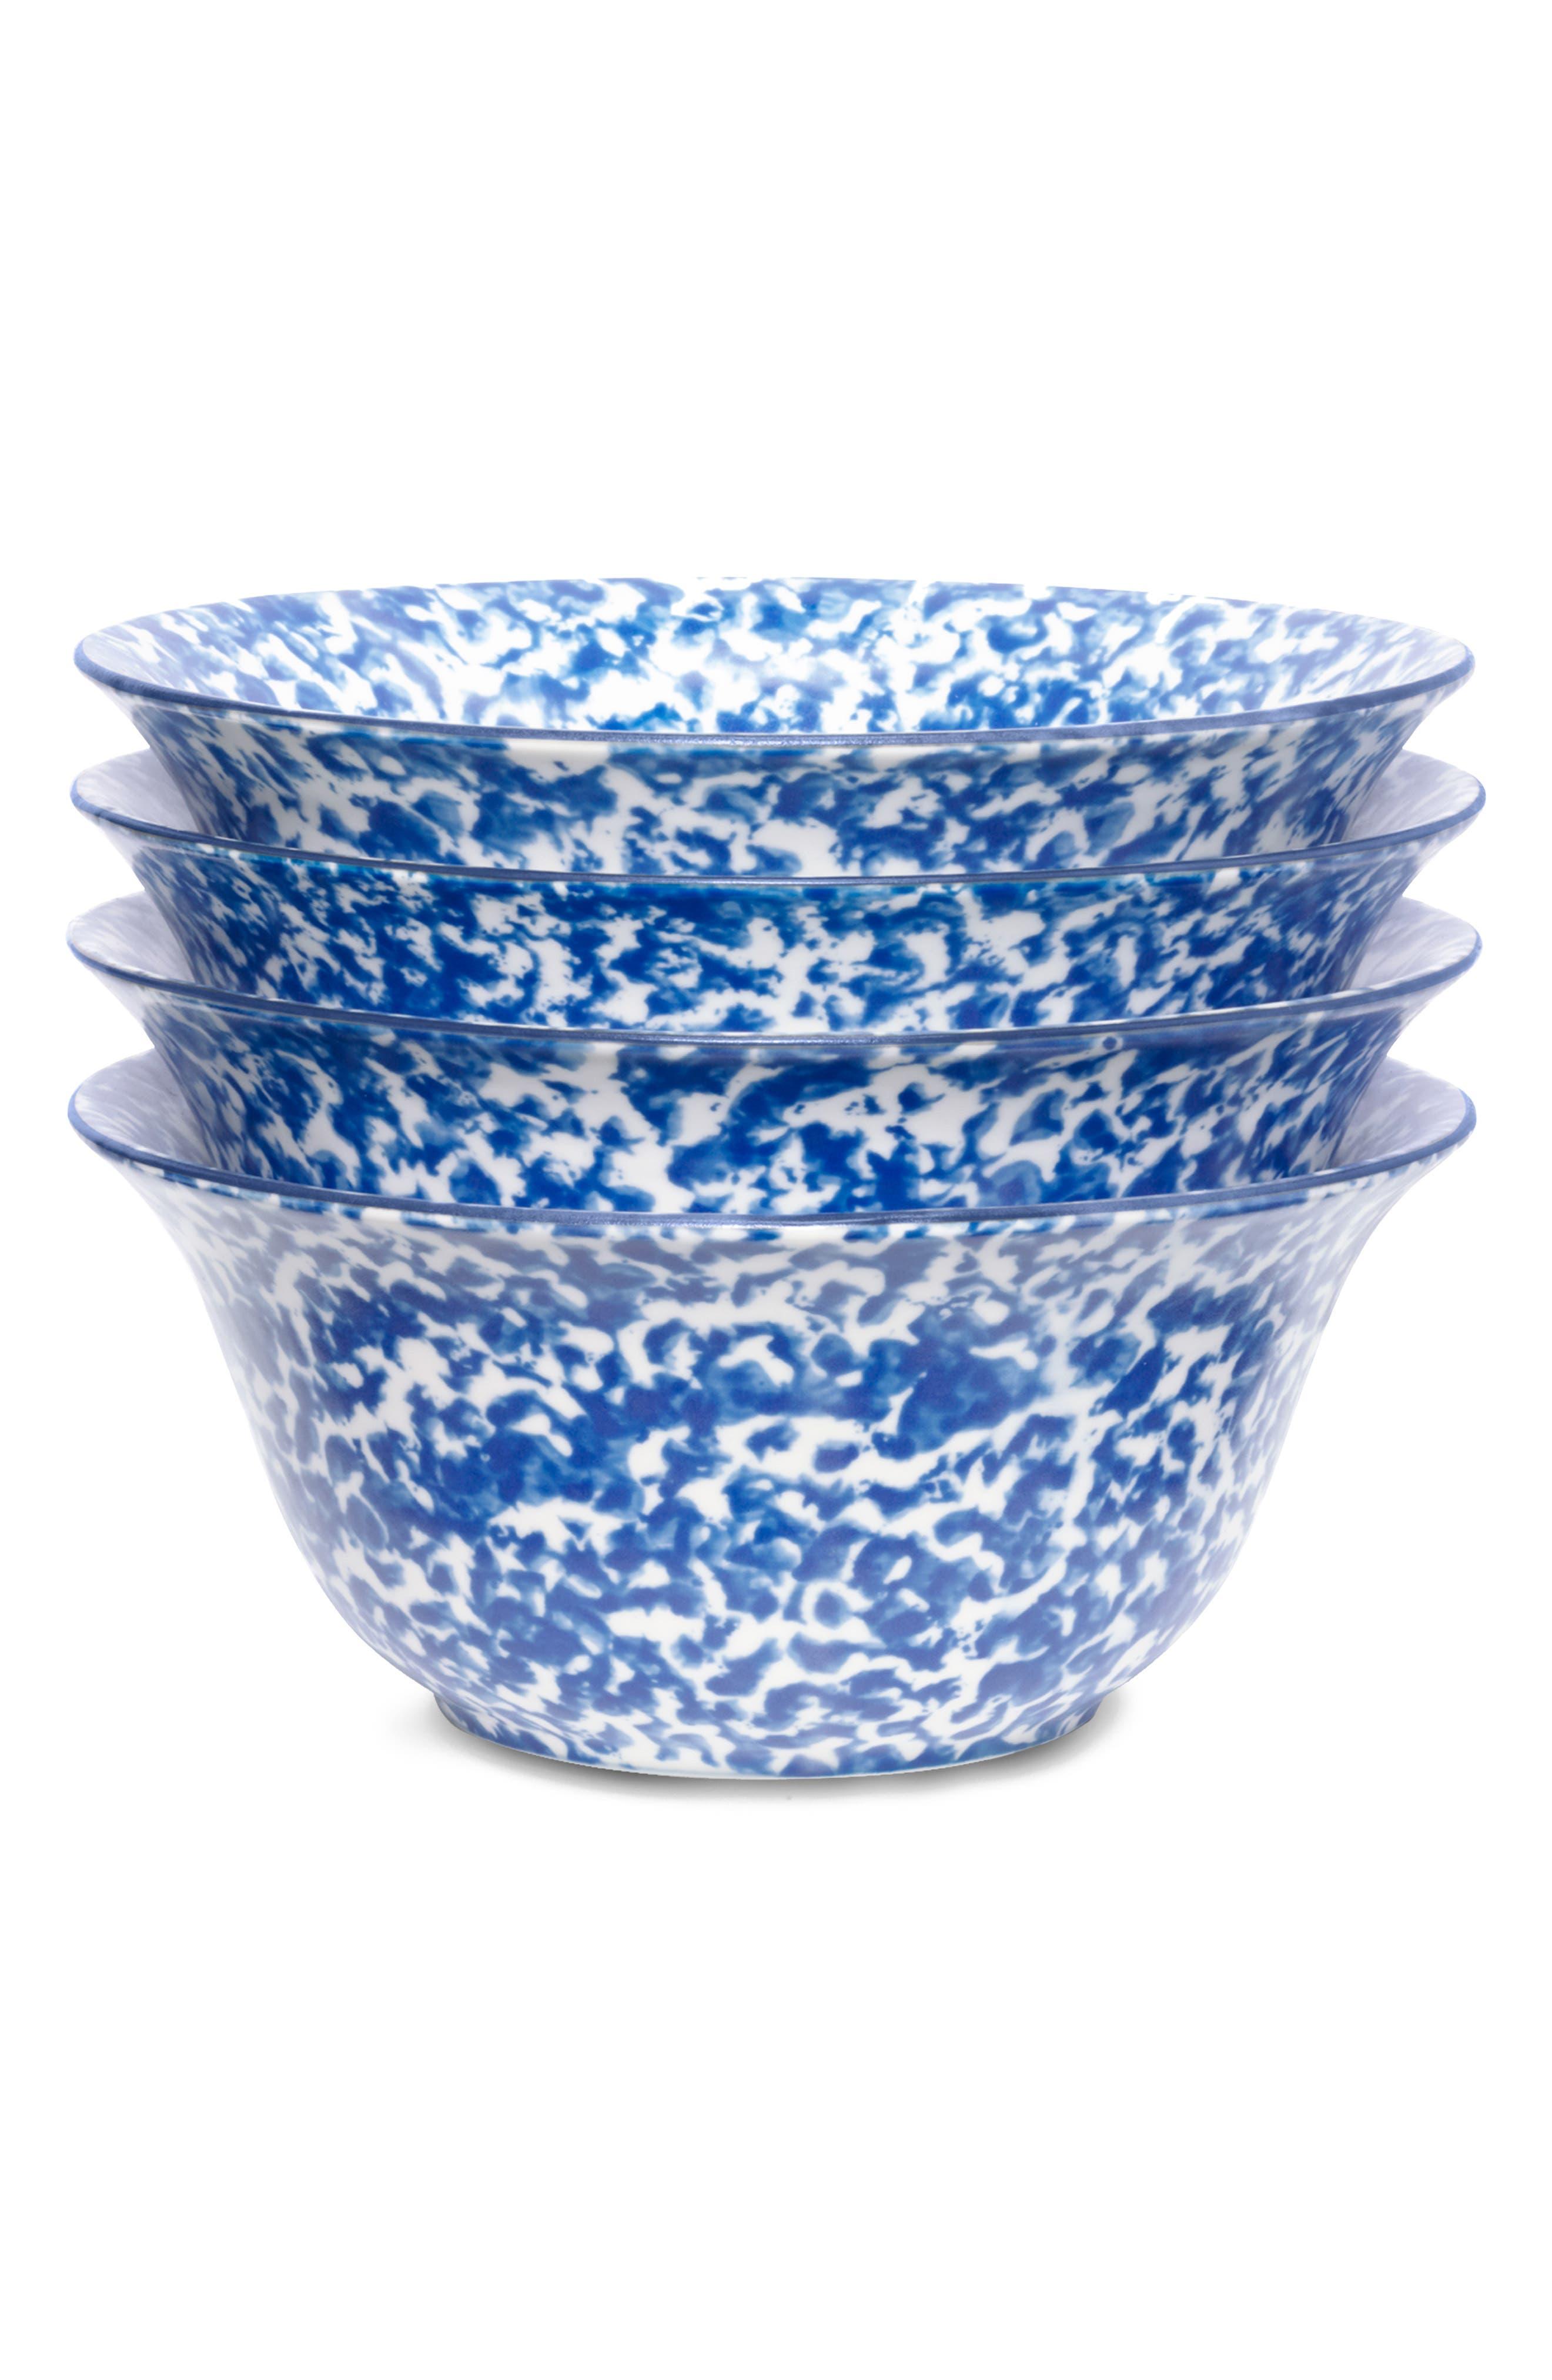 Set of 4 Spongeware Bowls,                             Alternate thumbnail 2, color,                             CLASSIC SPONGE